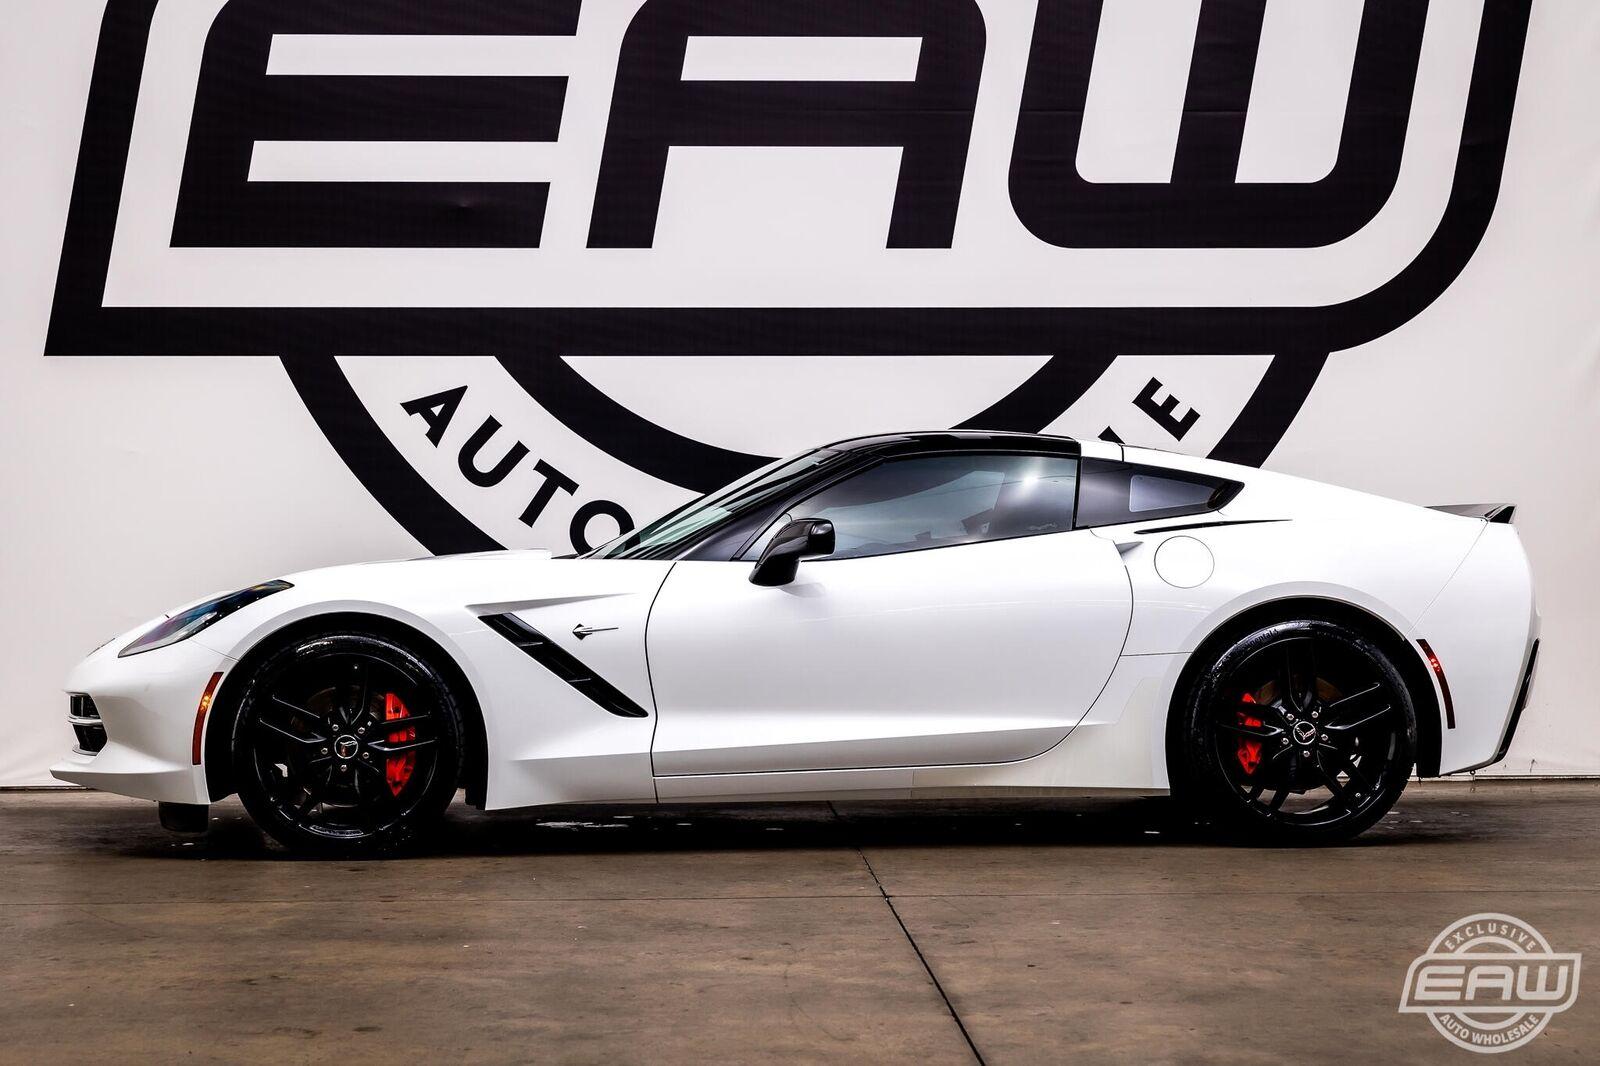 2014 White Chevrolet Corvette Coupe 1LT   C7 Corvette Photo 6